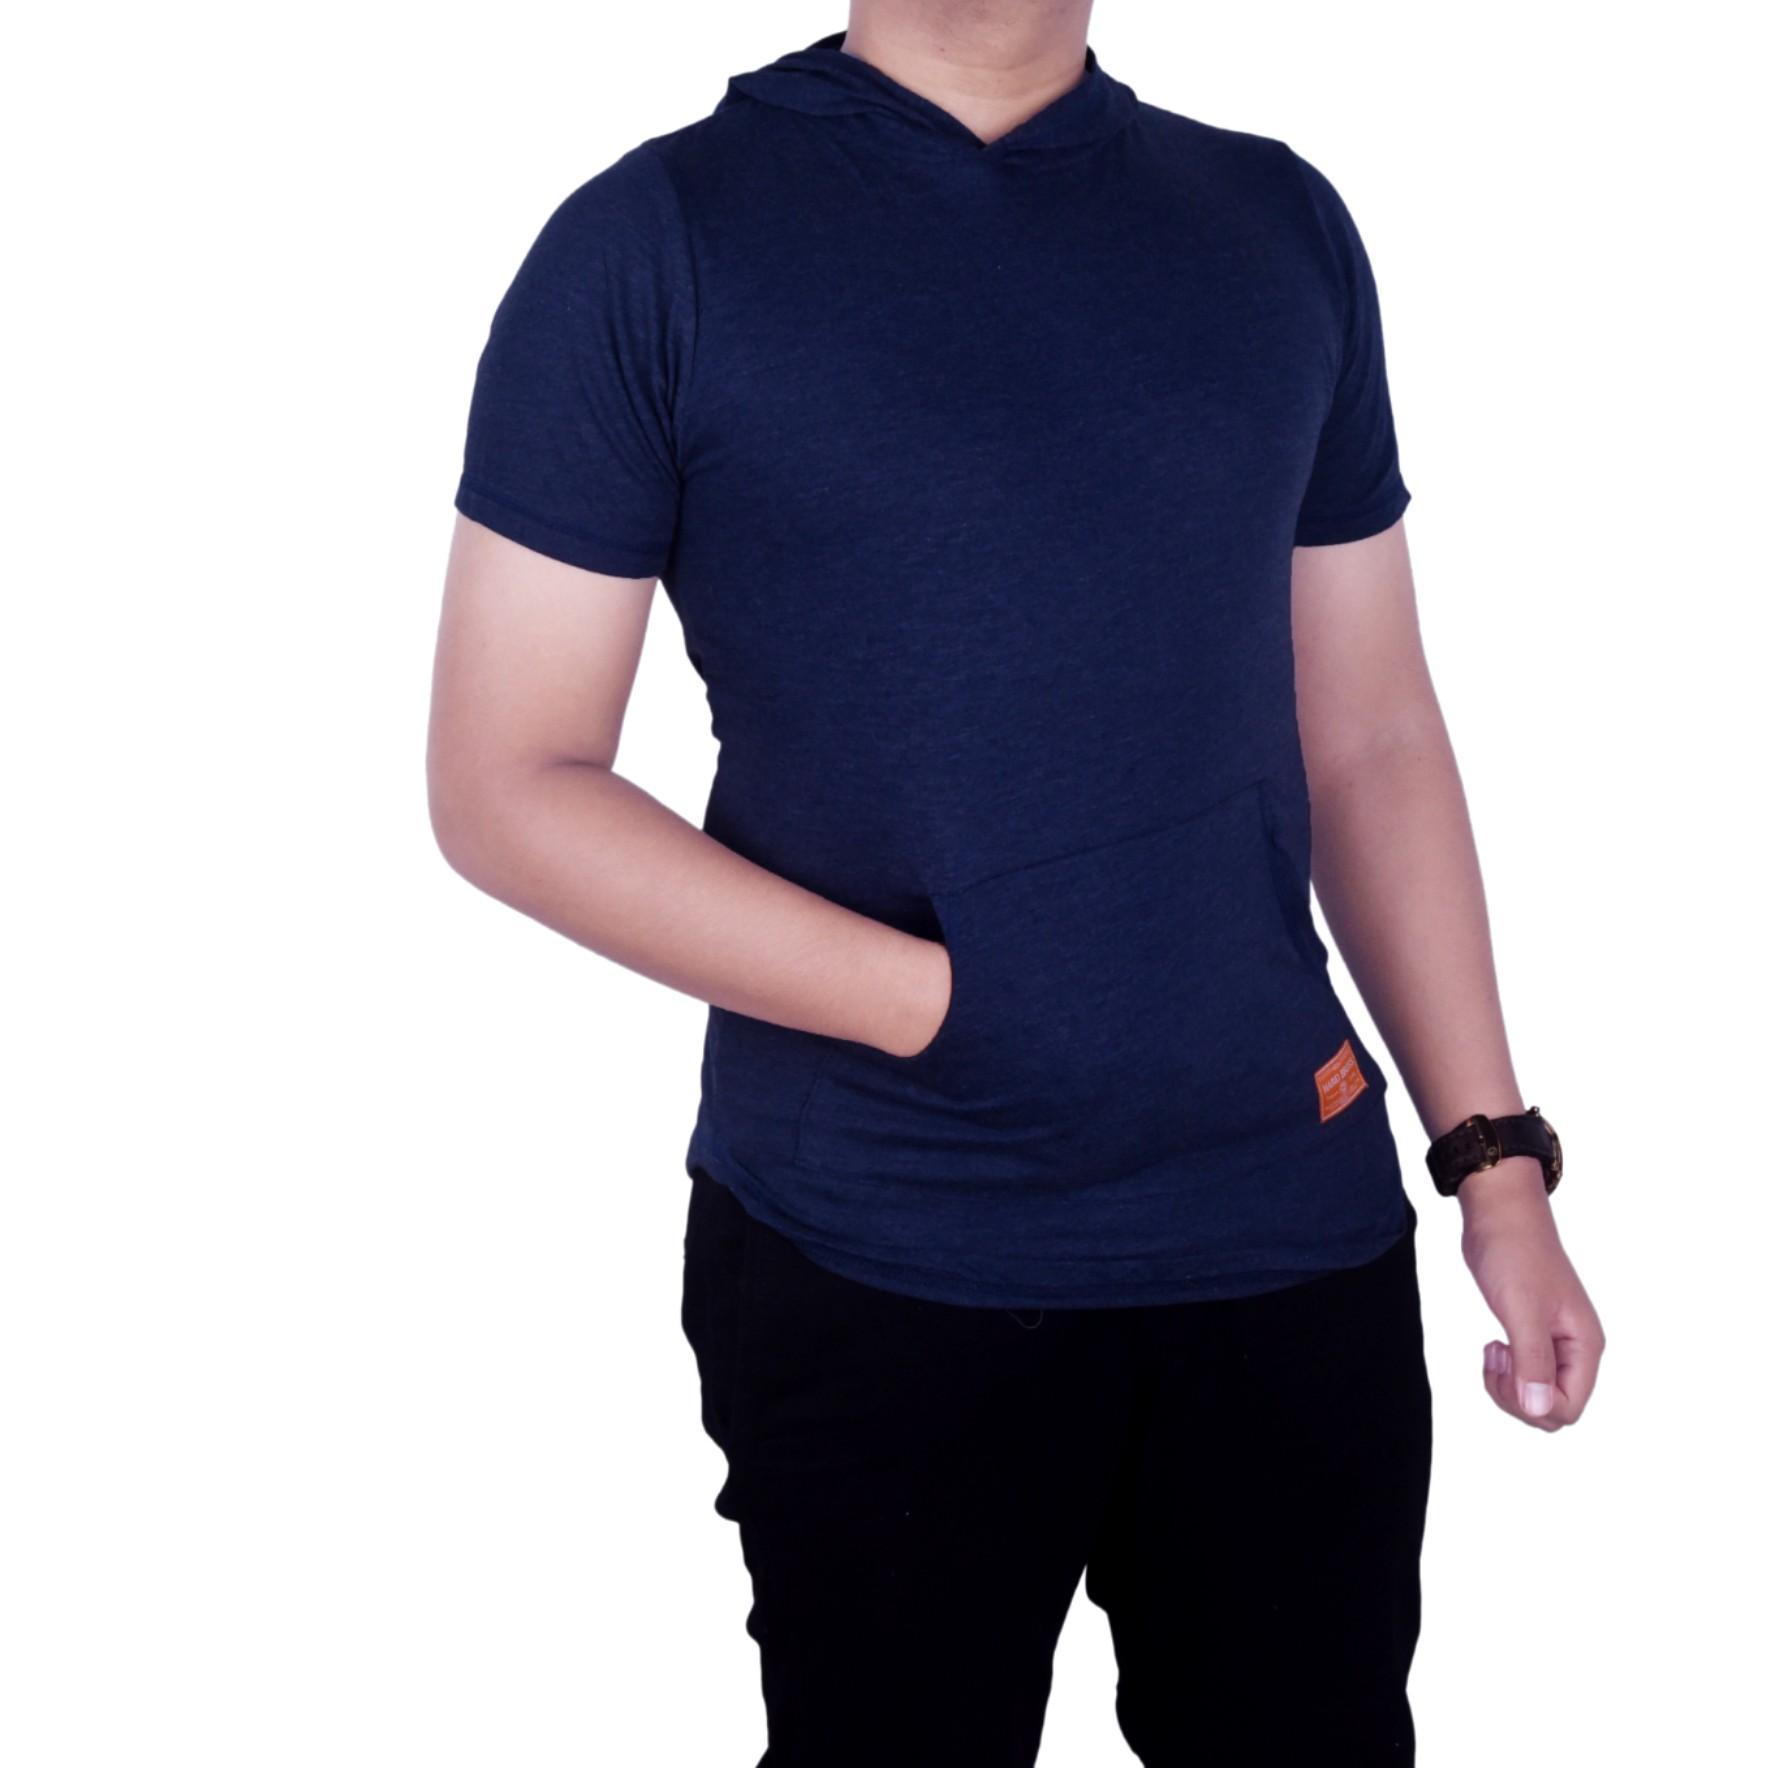 Bsg_Fashion1 Baju Kaos Distro Polos Navy Lengan Pendek Hoodie Unisex/Kaos oblong/Kaos Murah